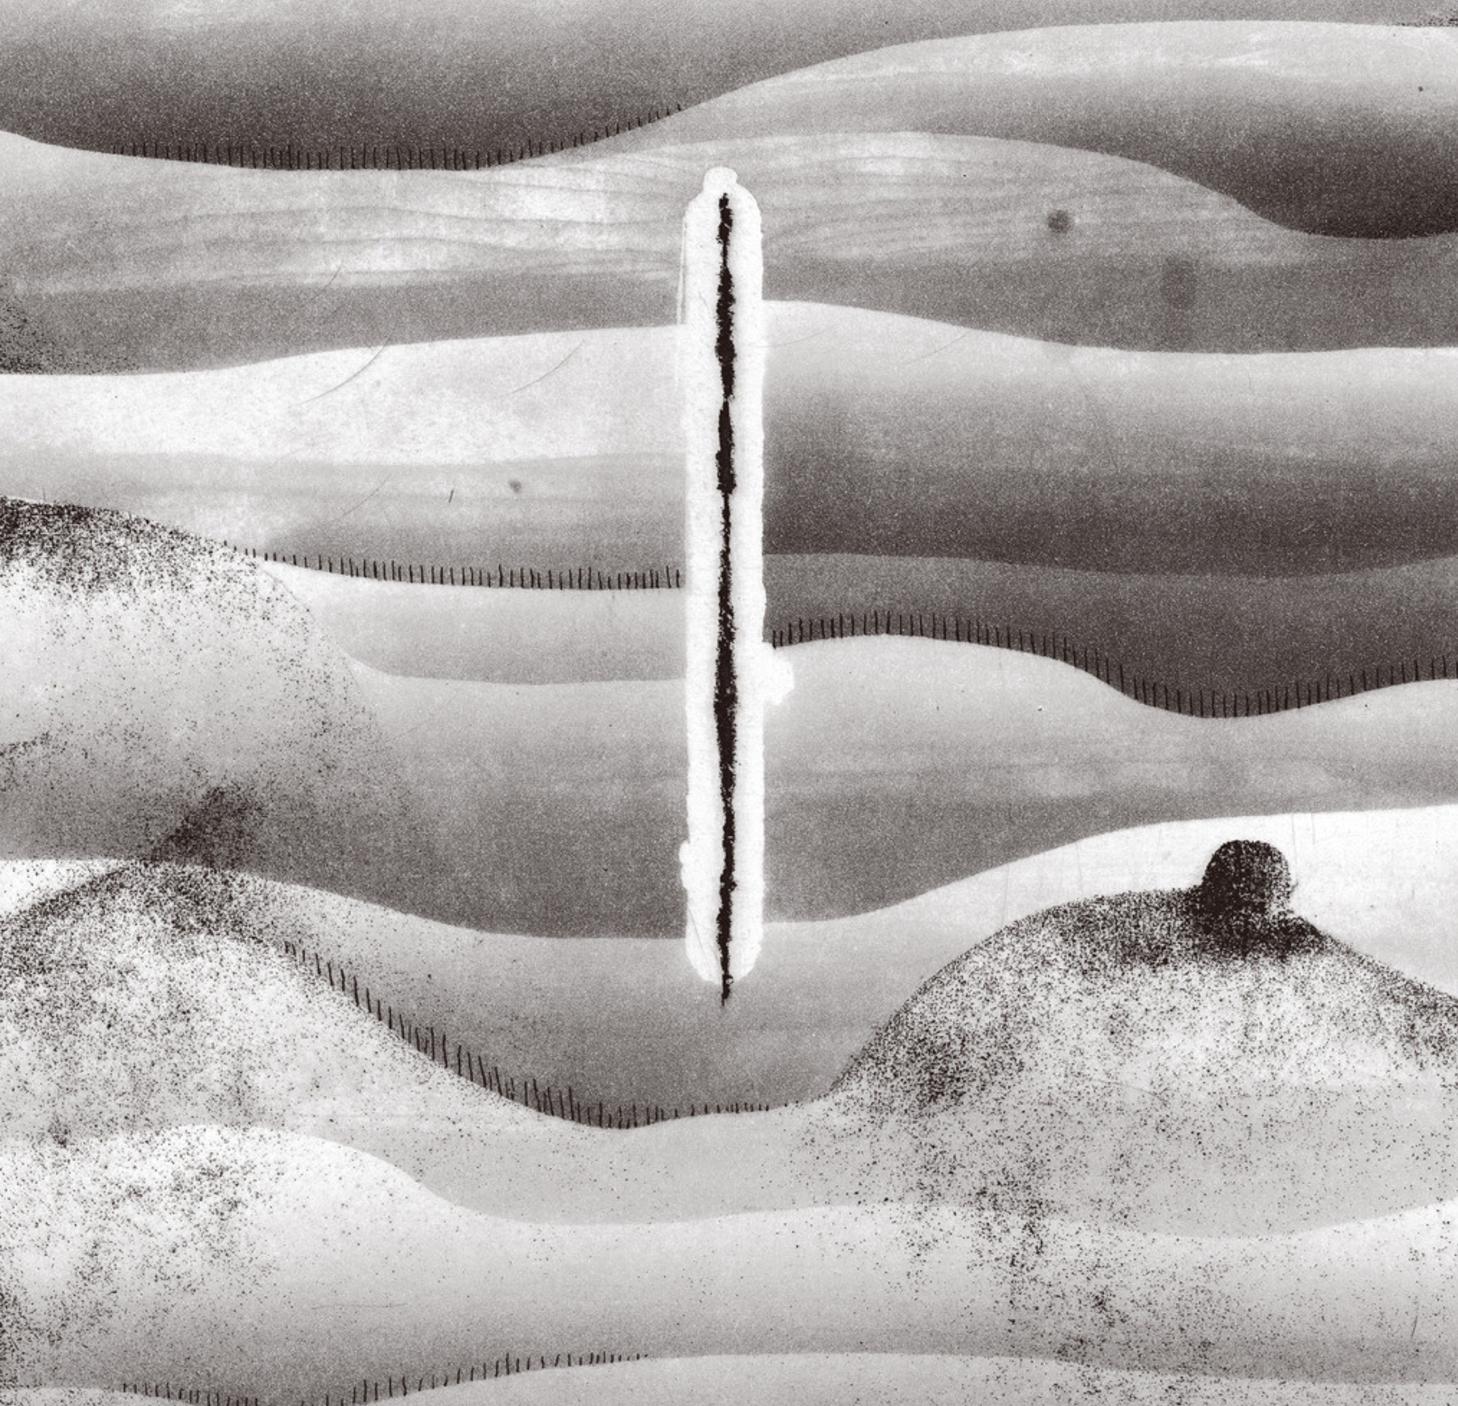 cornelius mellow waves album Cornelius releases first album in 11 years, Mellow Waves: Stream